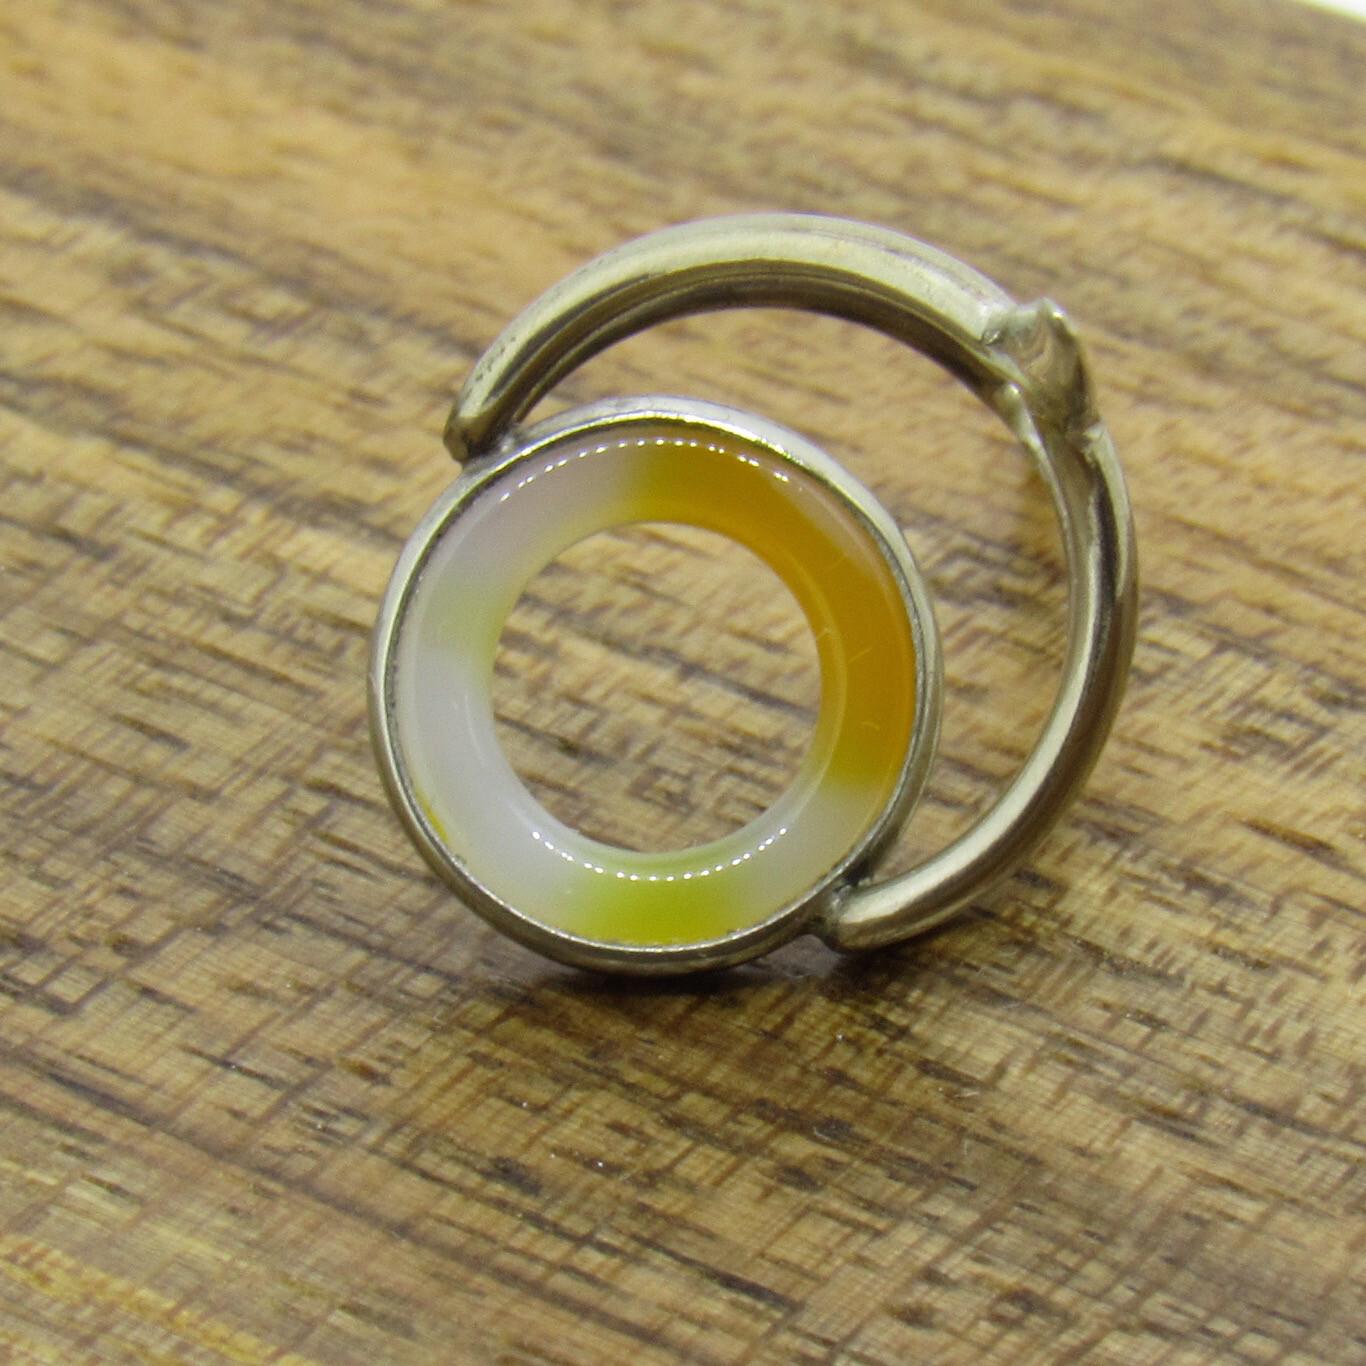 Agate Perfect Stripping Guide 10mm orange white Chrome